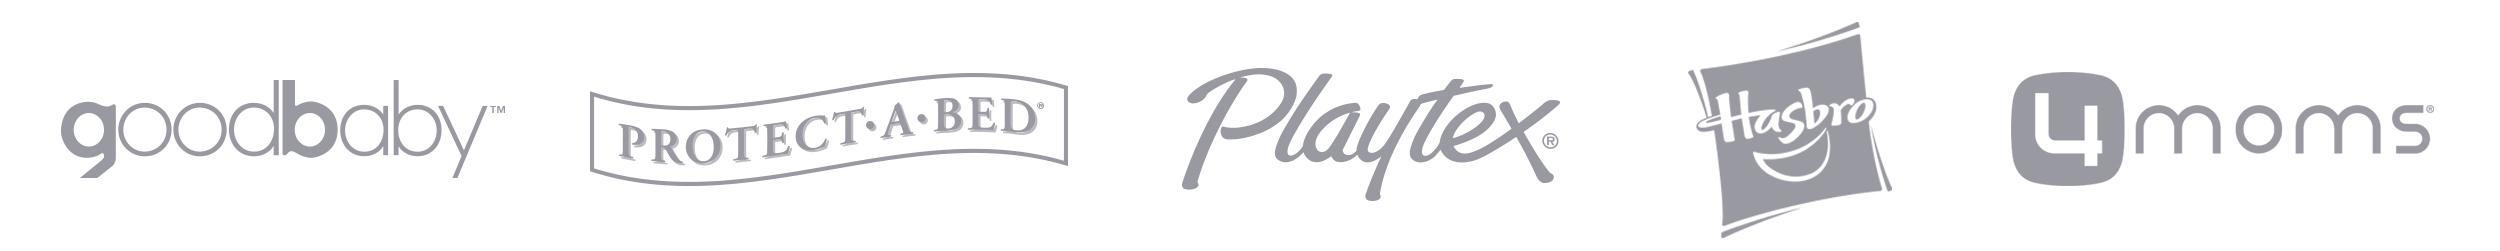 client logos_rotation_gray_2.jpg